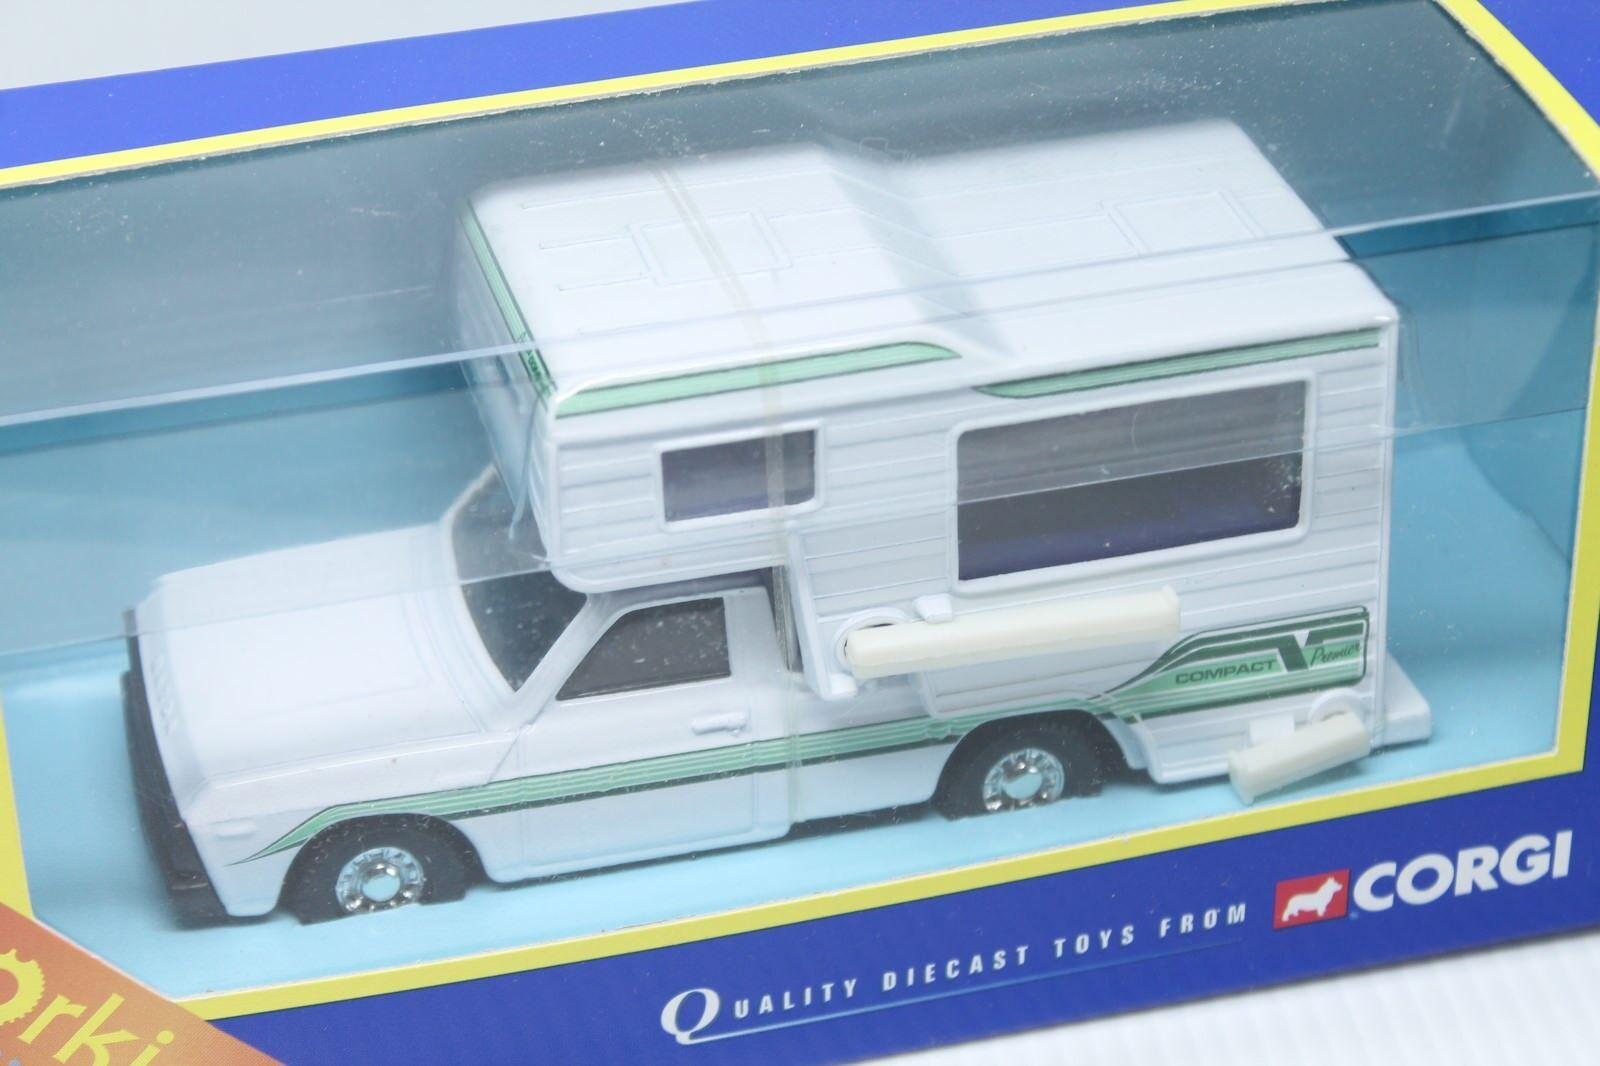 CORGI TOYS  MAZDA Camper Van  ORIGINAL  Neuf dans sa boîte  2000  Comme neuf